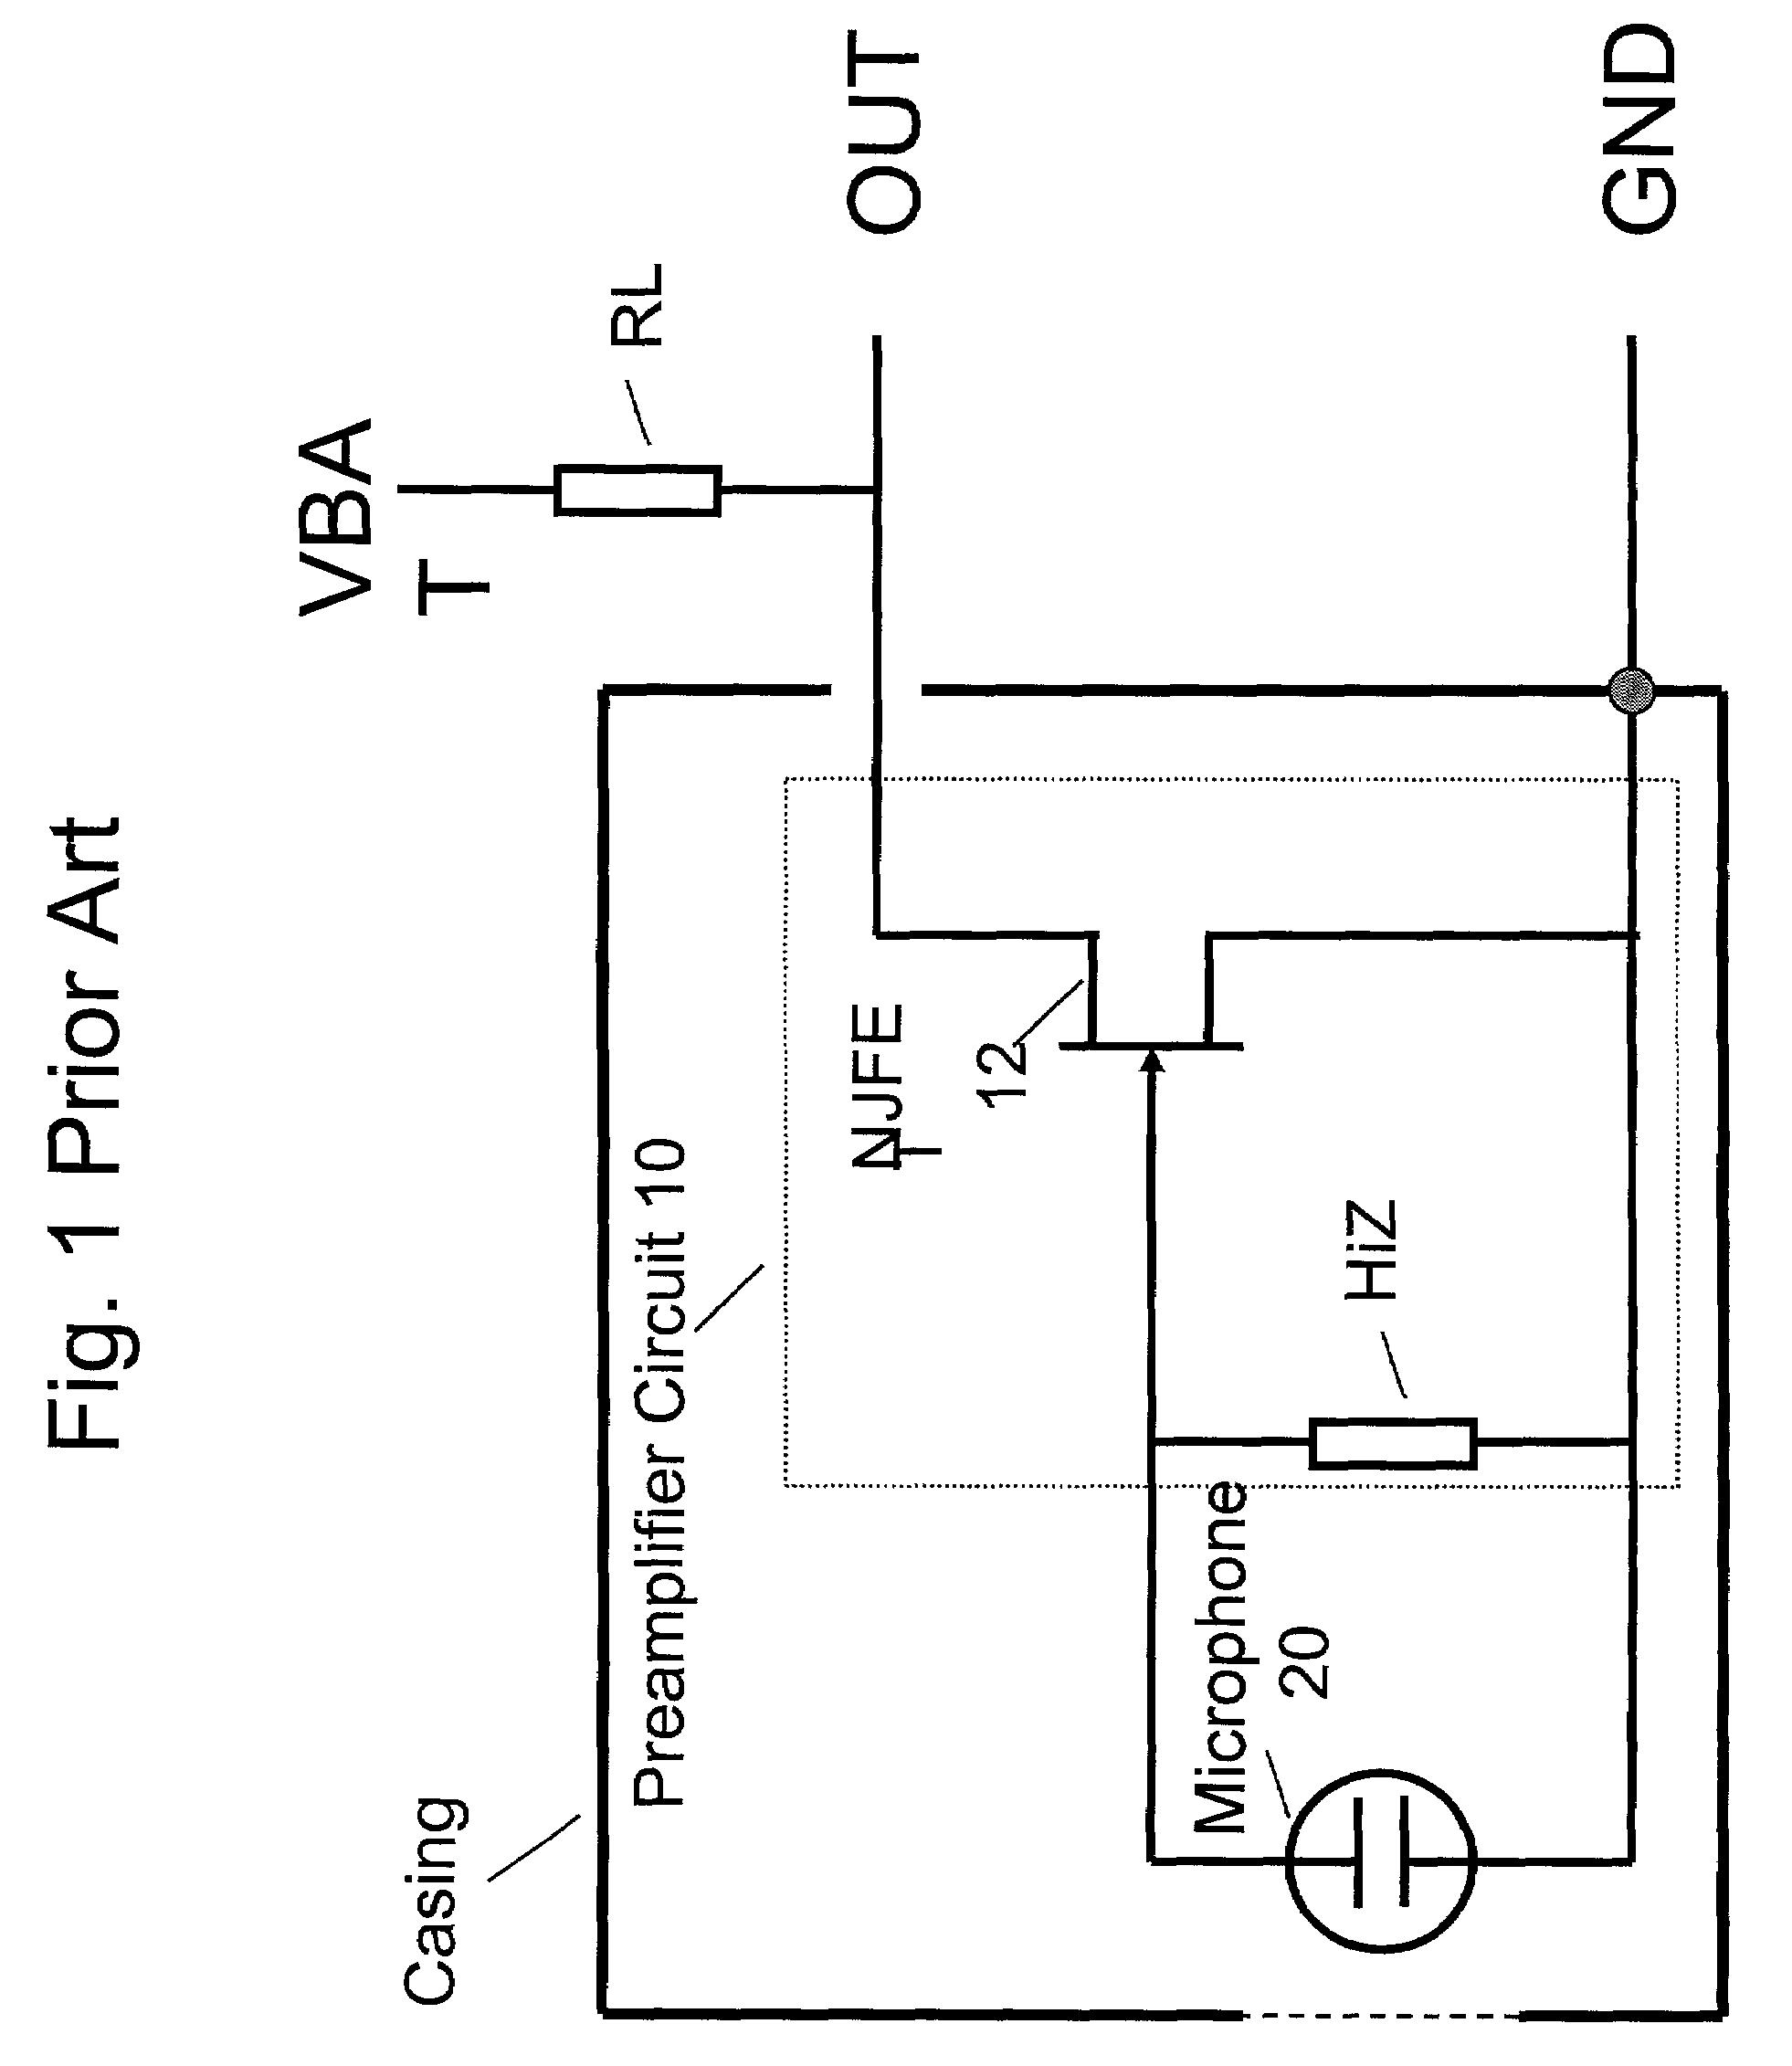 Condenser mic wiring diagram images